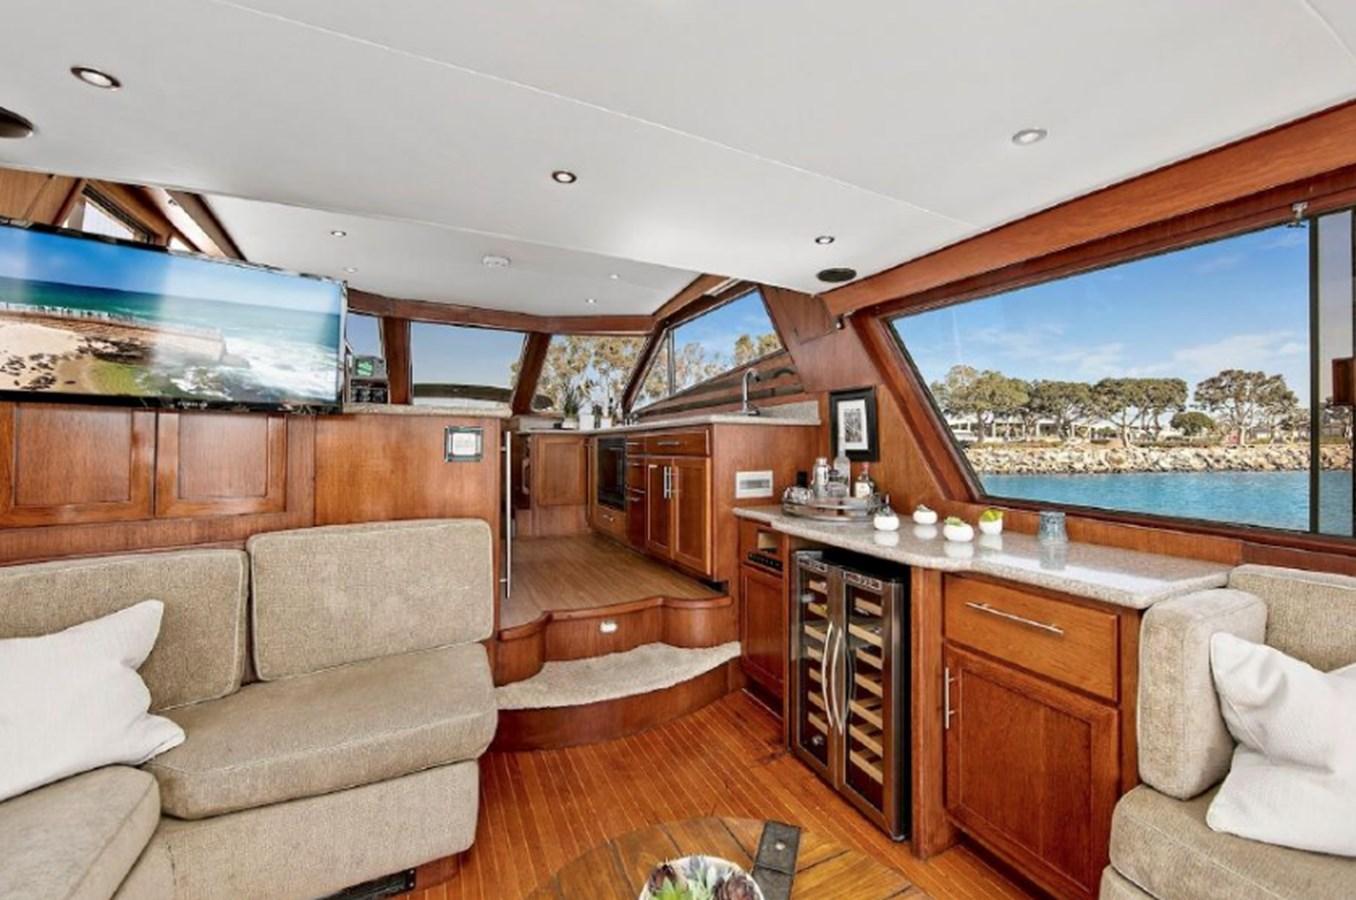 Screen Shot 2020-02-19 at 10.26.23 AM 1985 MONTE FINO 55 Motor Yacht  Motor Yacht 2850675